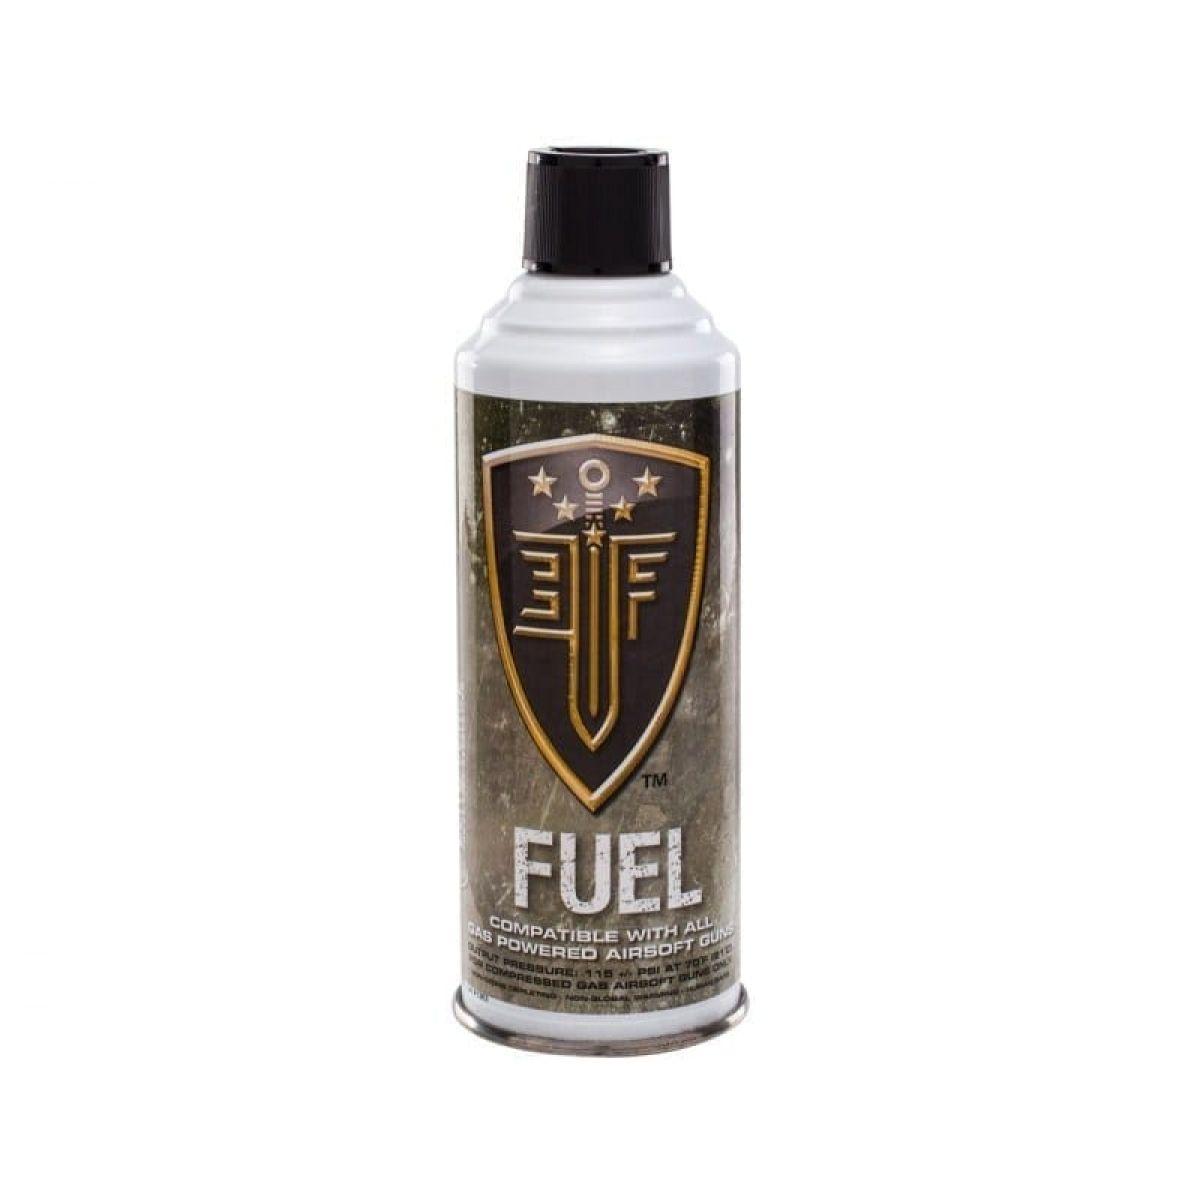 Elite Force Umarex Airsoft Green Gas – Compressed Gas 8 oz Bottle